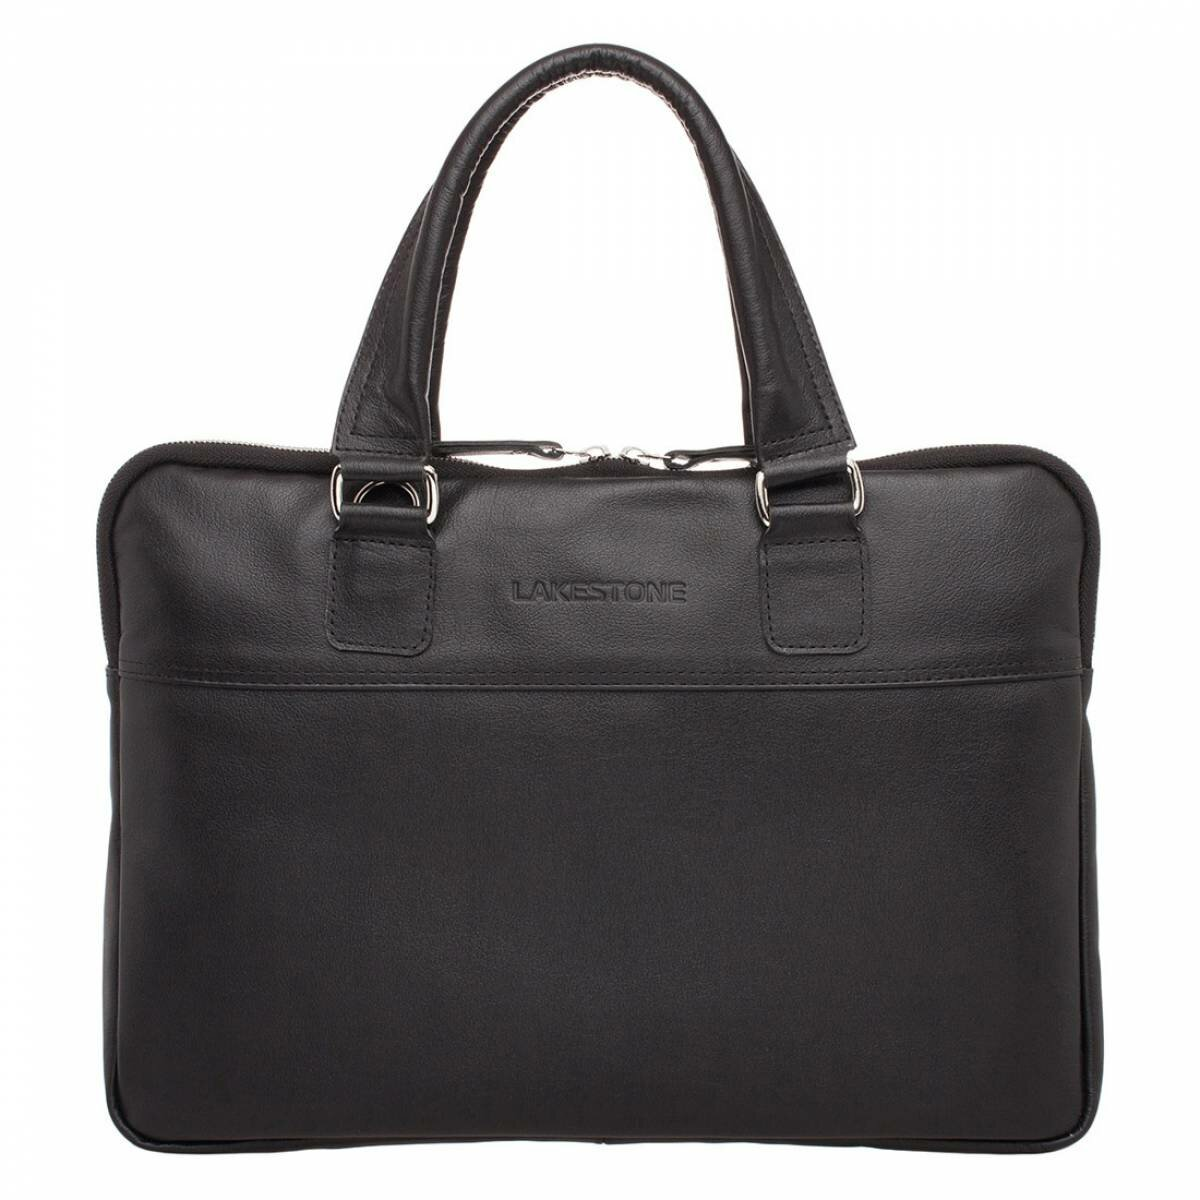 Деловая сумка Anson Black мужская кожаная черная